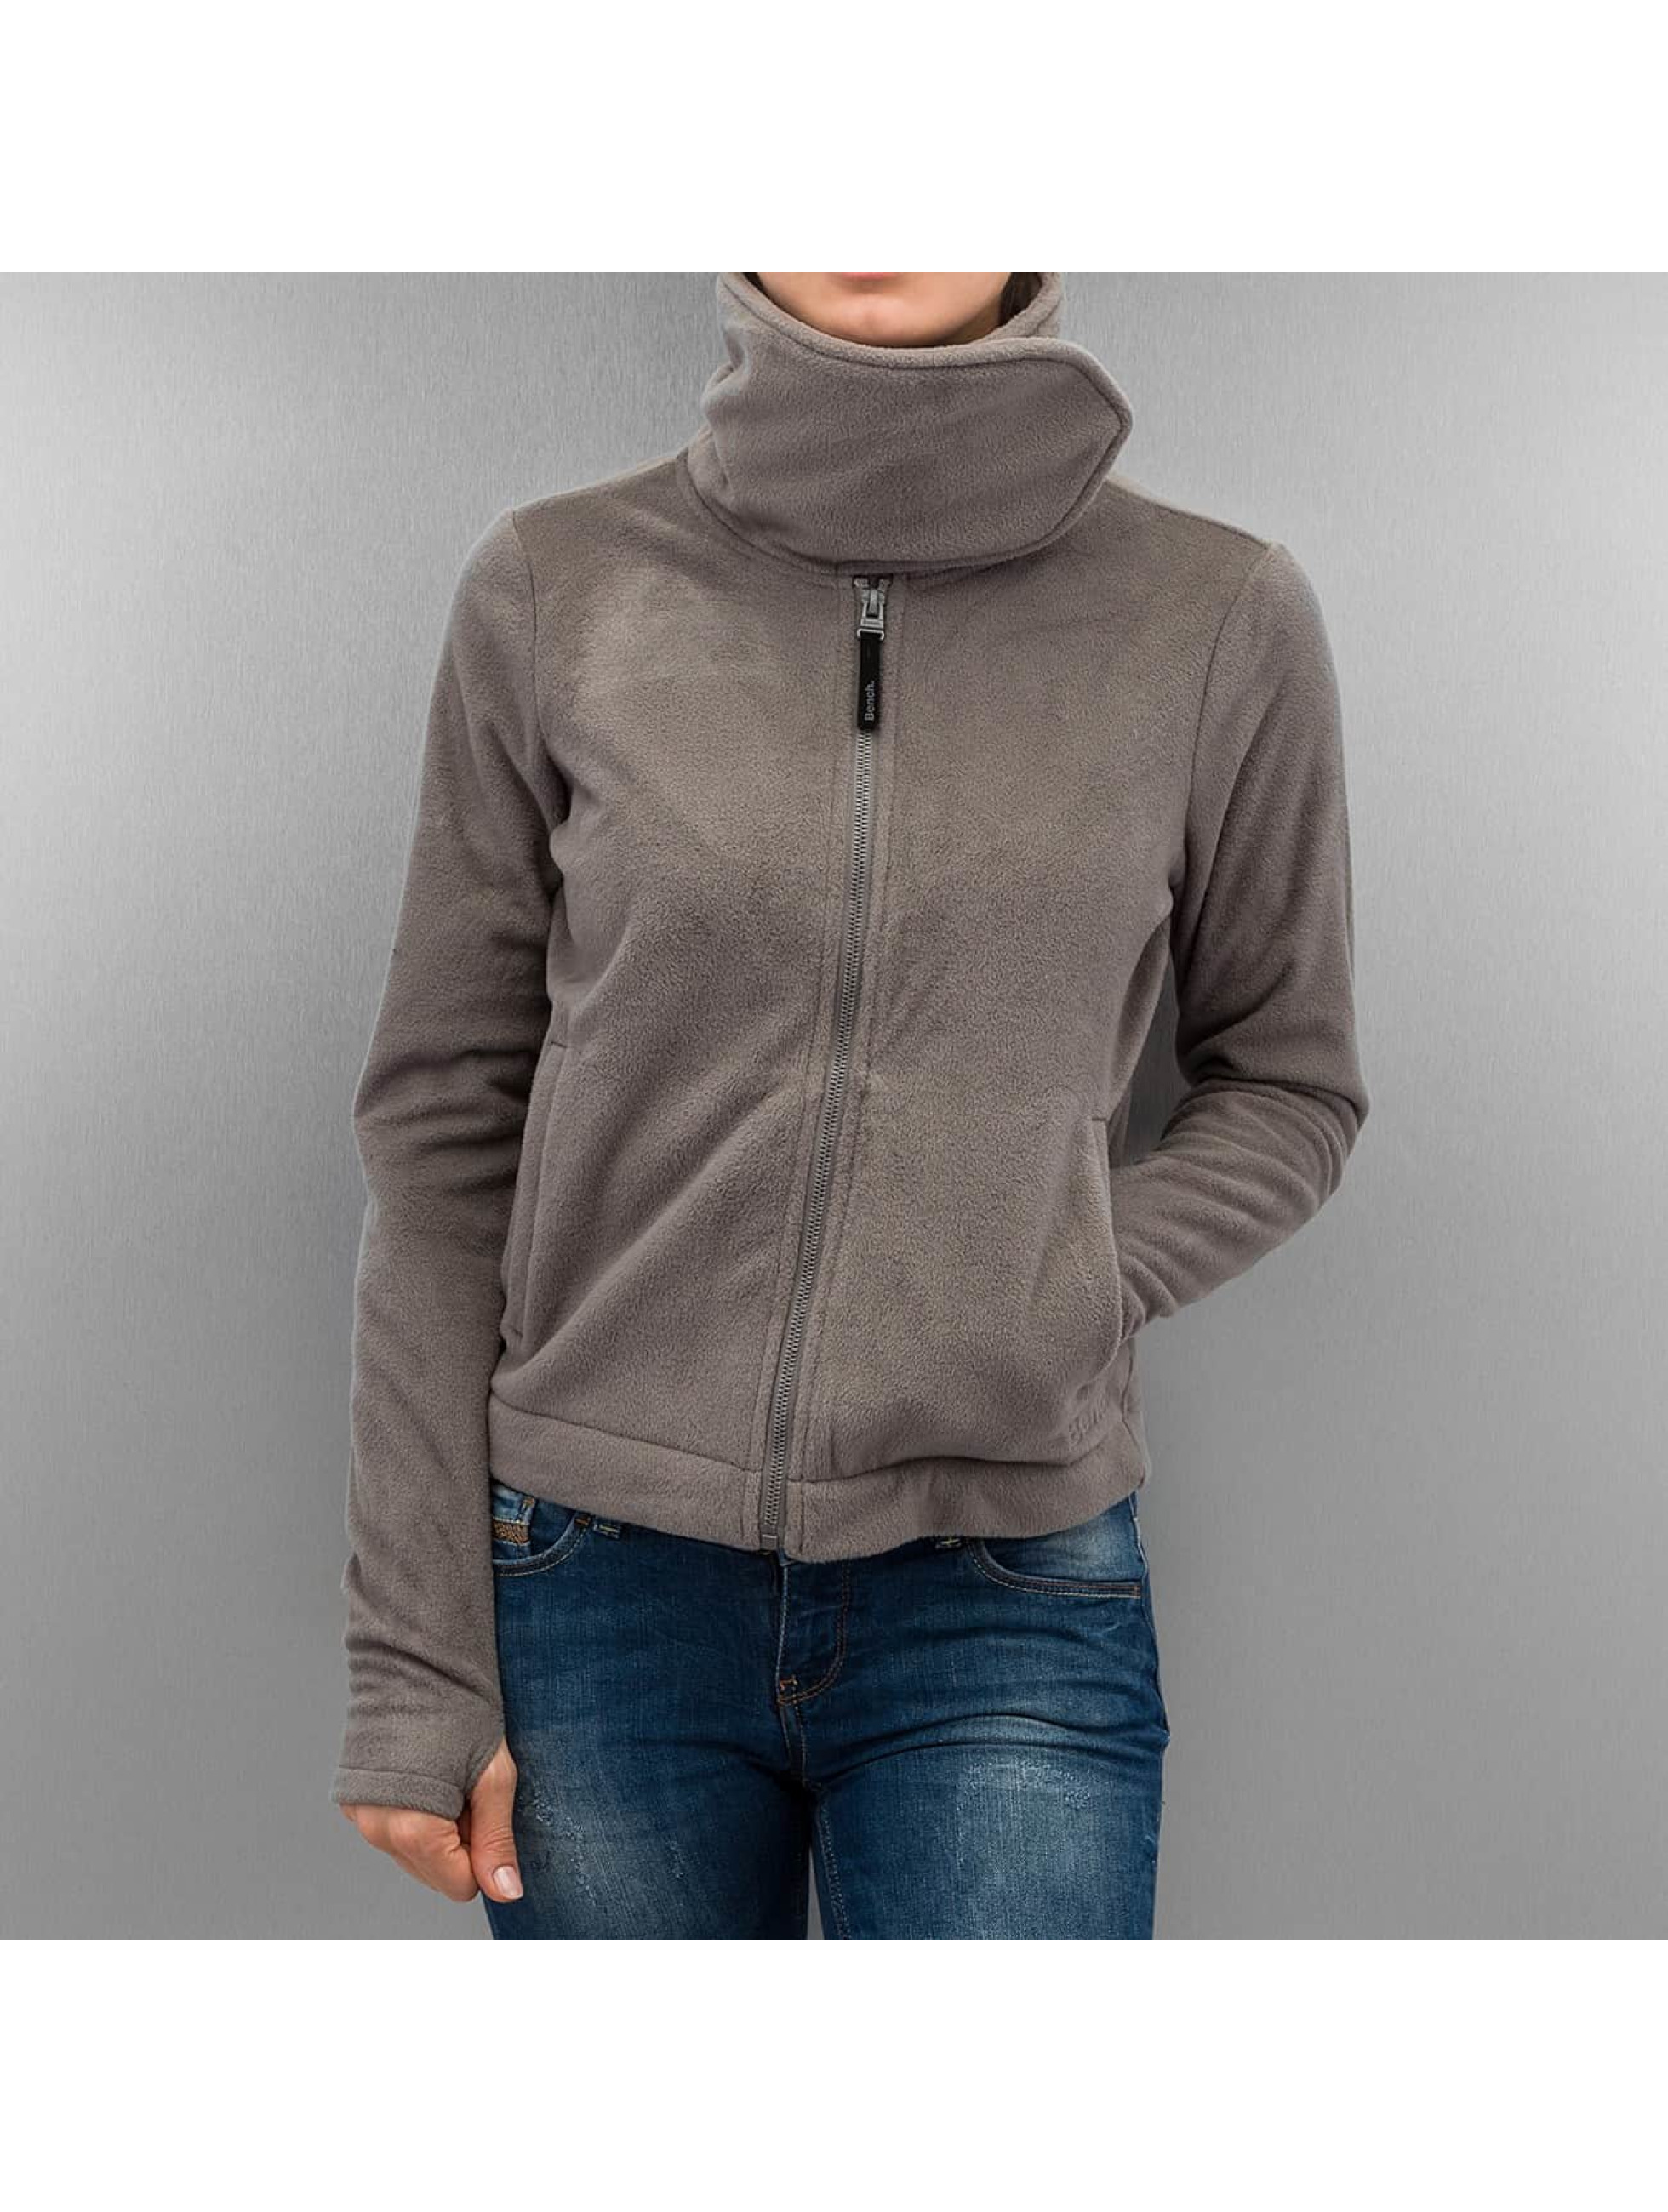 Bench Демисезонная куртка Difference Fleece Jacket серый